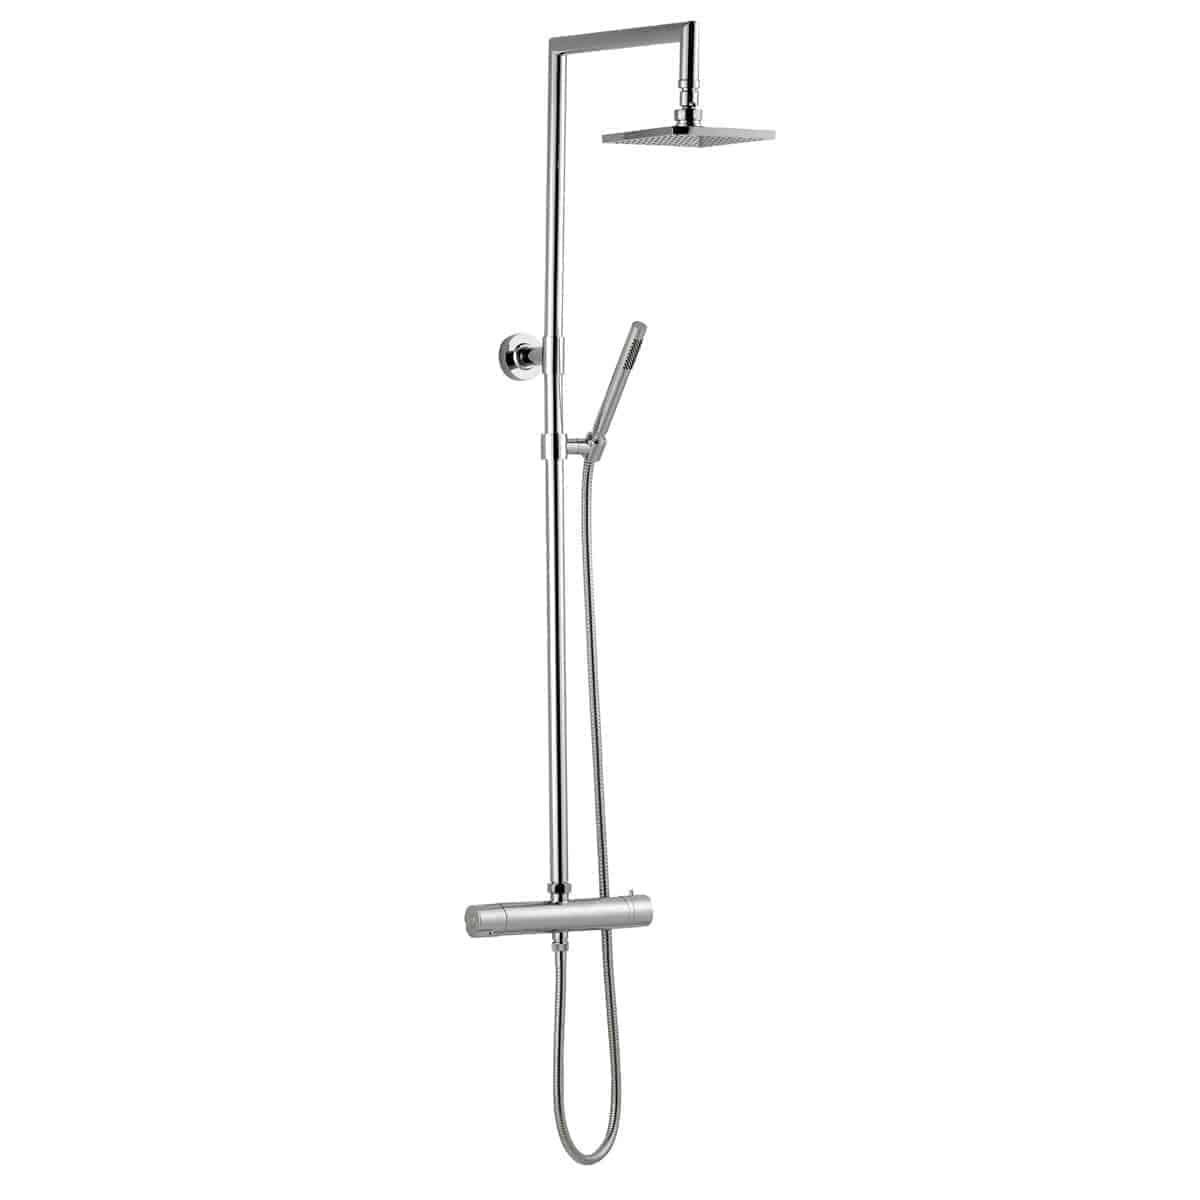 Thermostatic Bar Bathroom Shower Valve